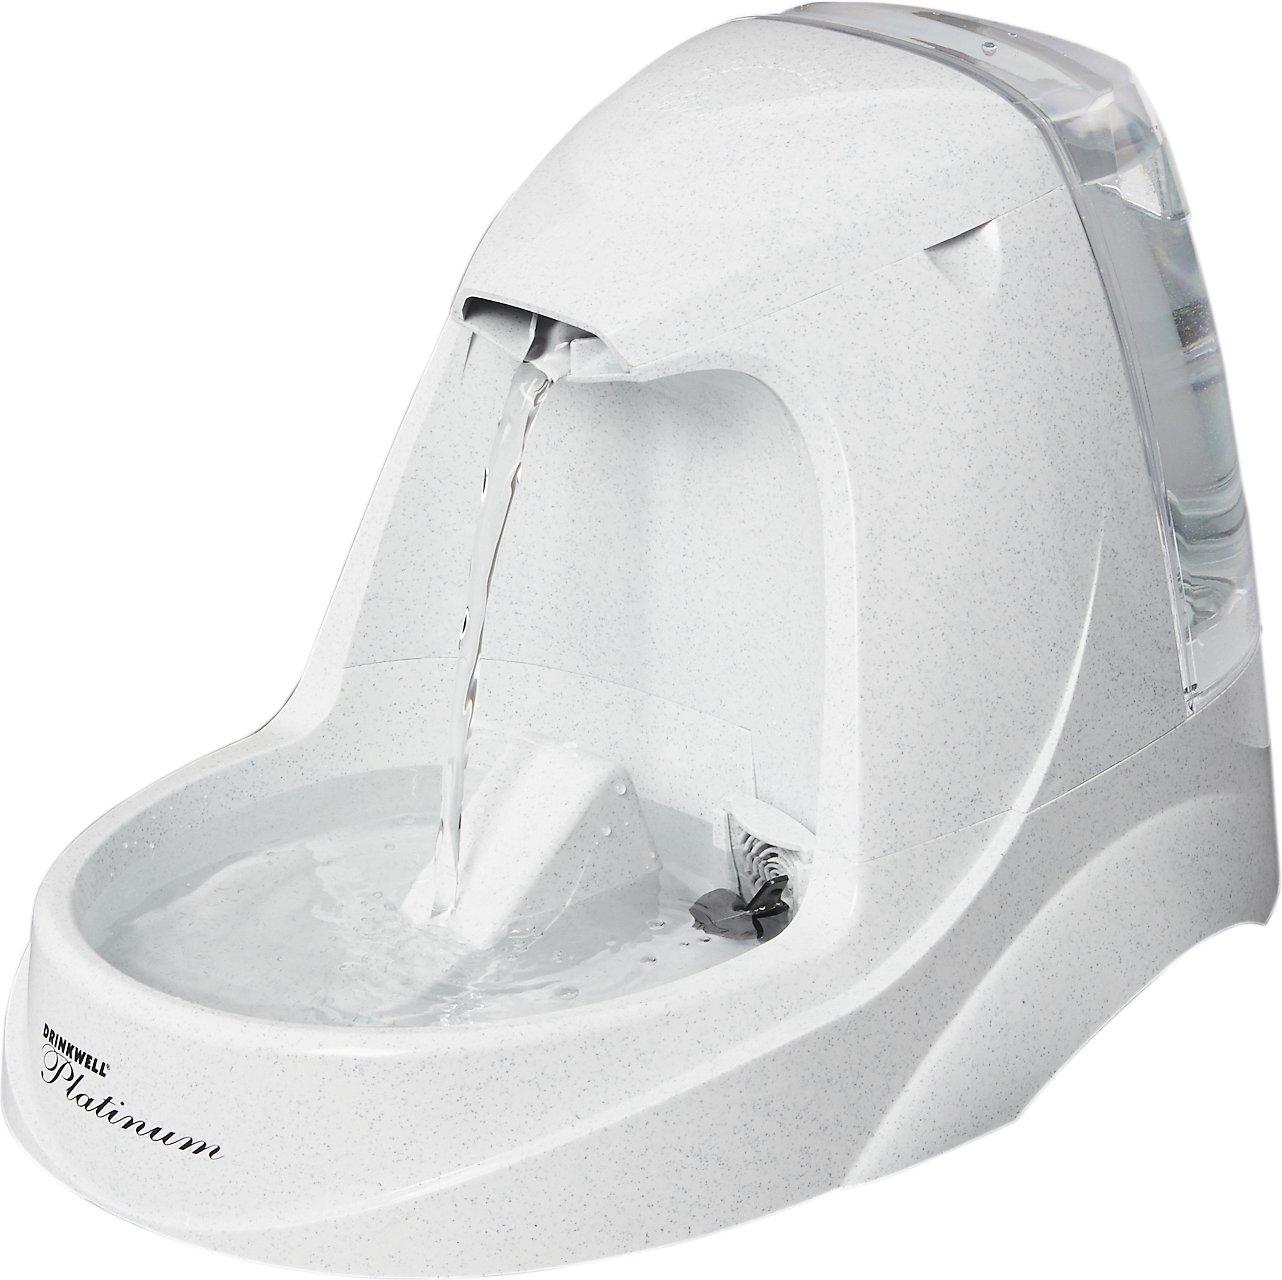 drinkwell platinum cat water fountain